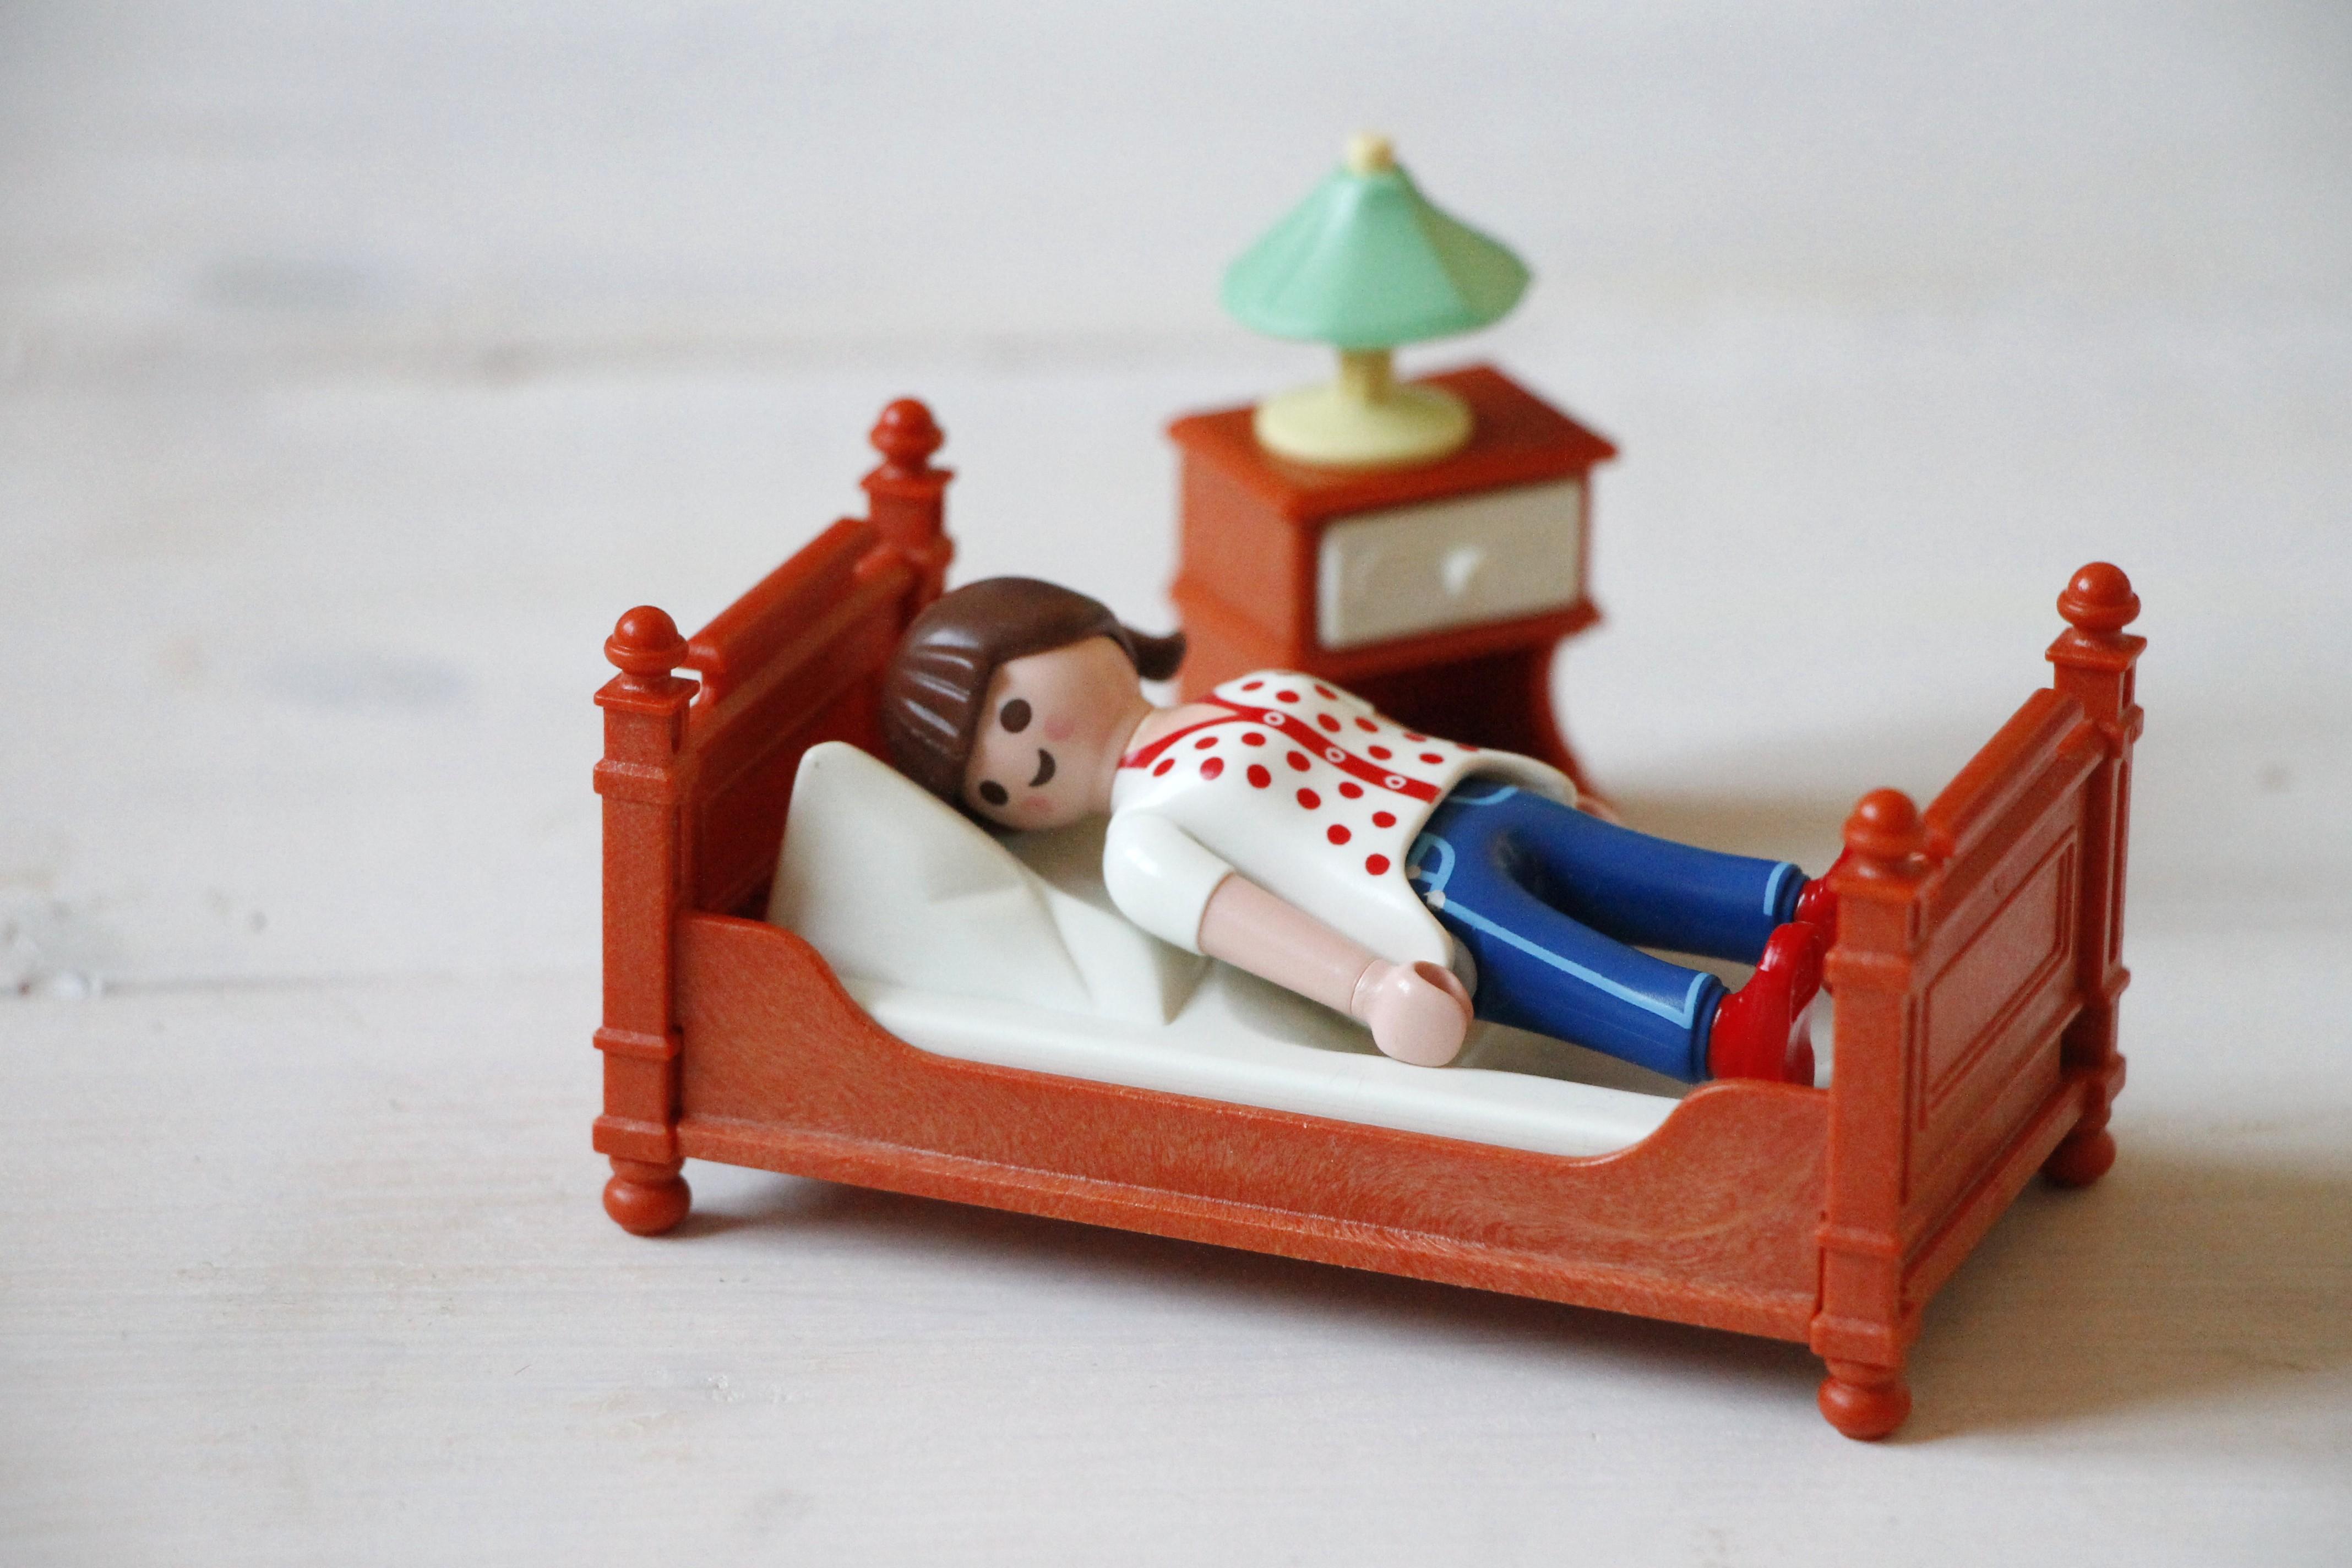 calmvalera hevert hom opathisches arzneimittel lavendelblog. Black Bedroom Furniture Sets. Home Design Ideas